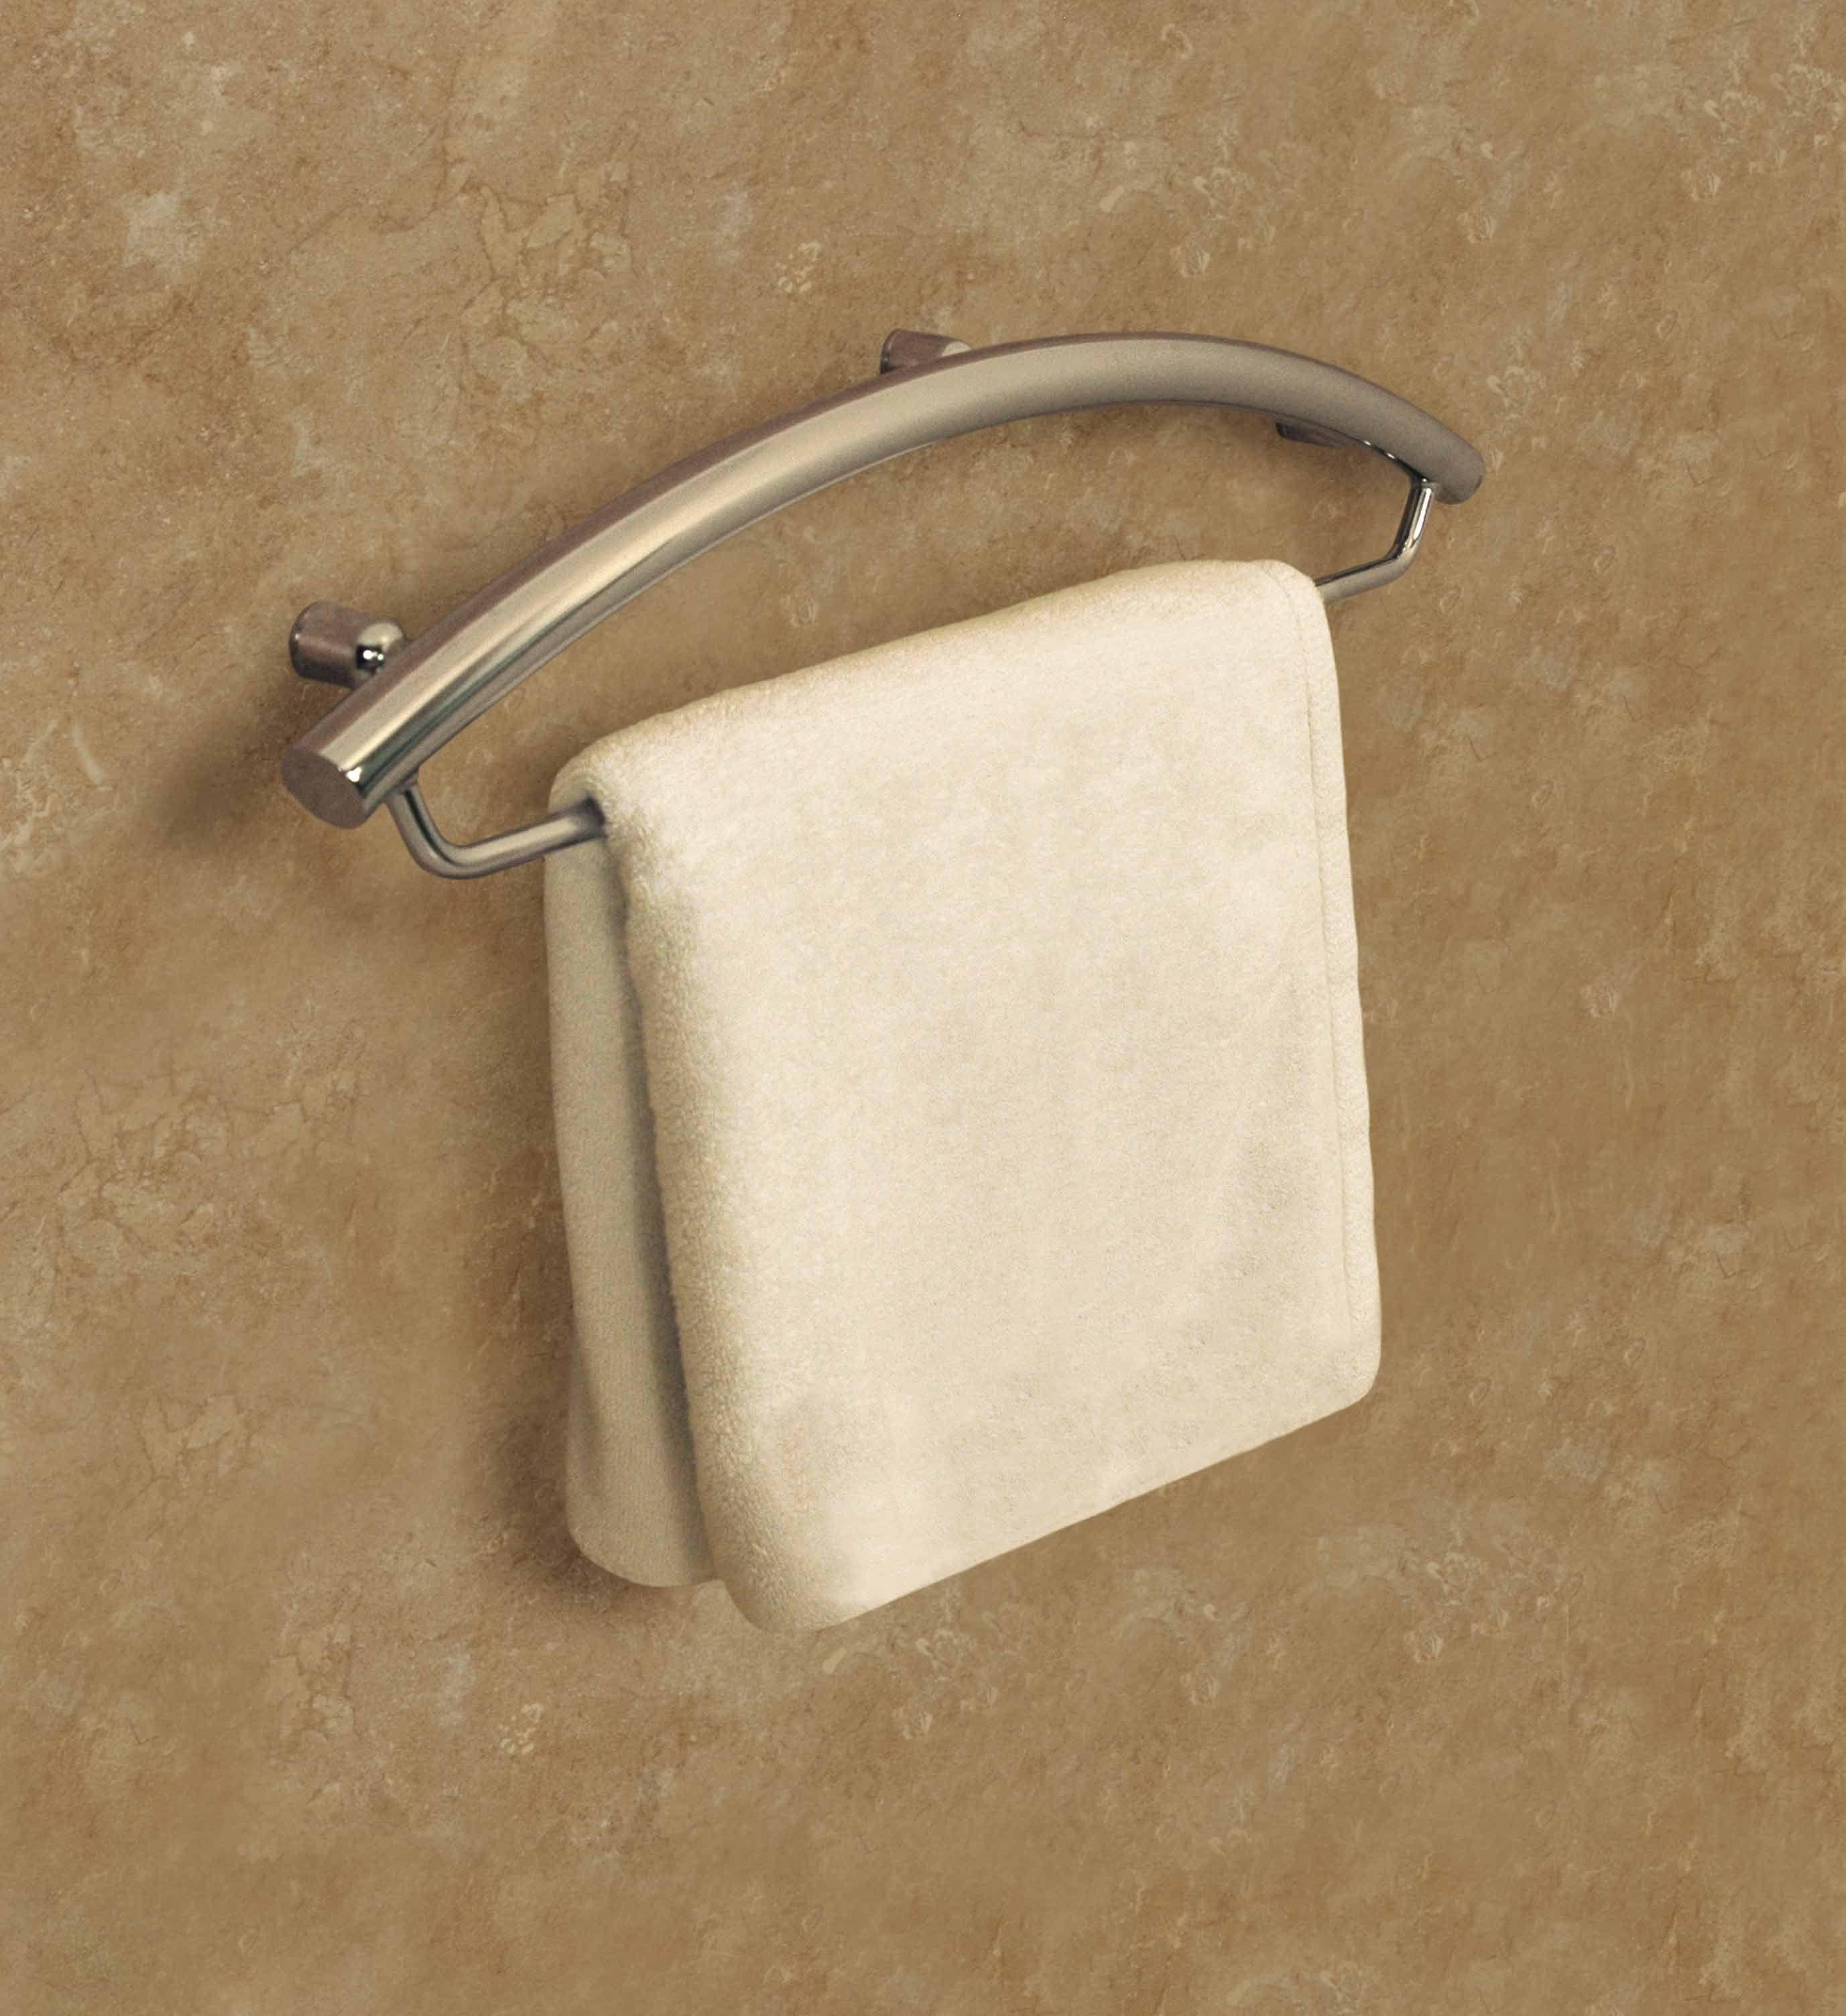 Very stylish grab bar towel bar my future bath and kitchen